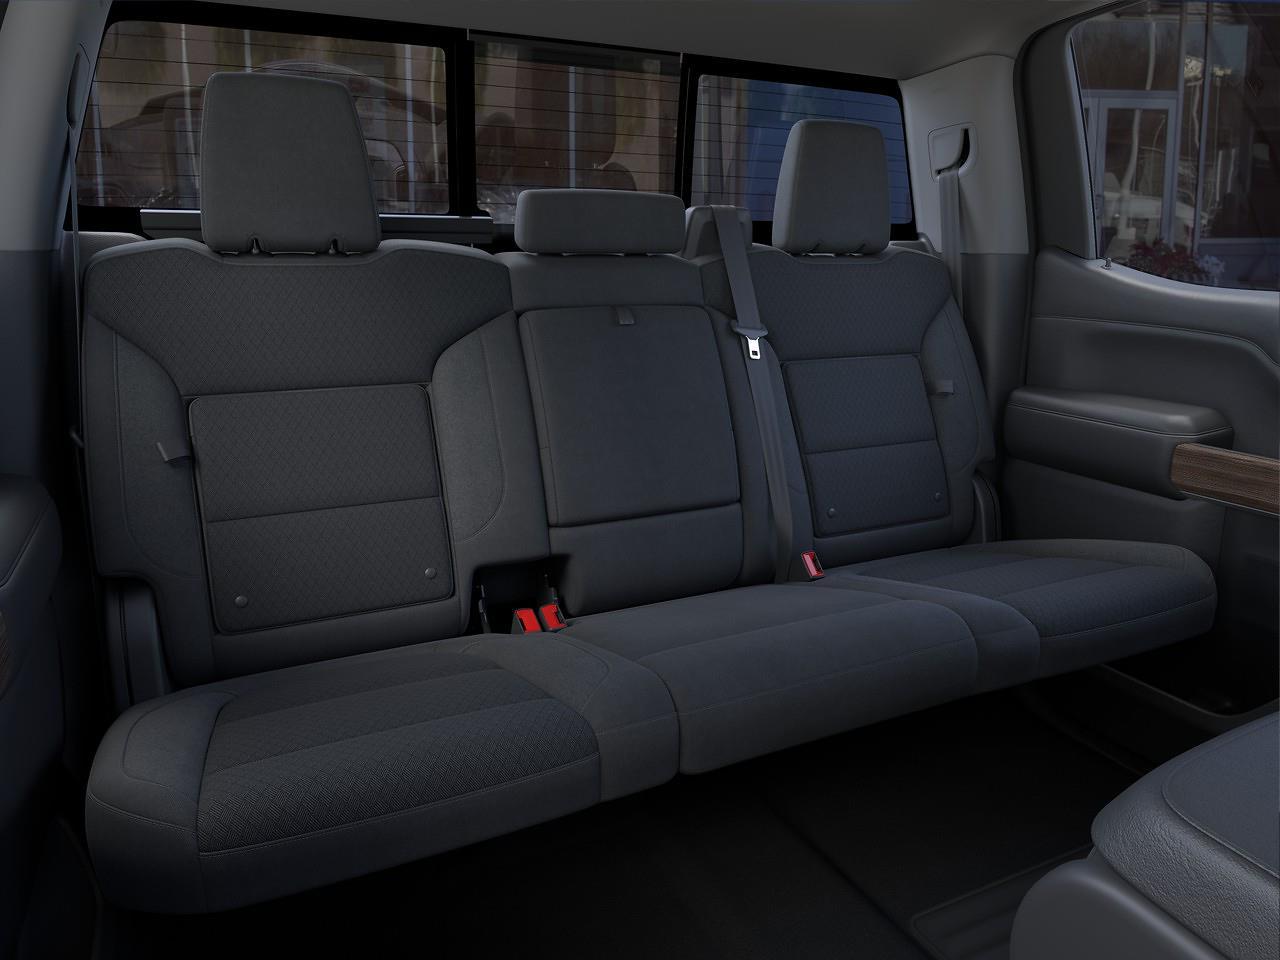 2021 Chevrolet Silverado 1500 Crew Cab 4x4, Pickup #CK1411 - photo 14